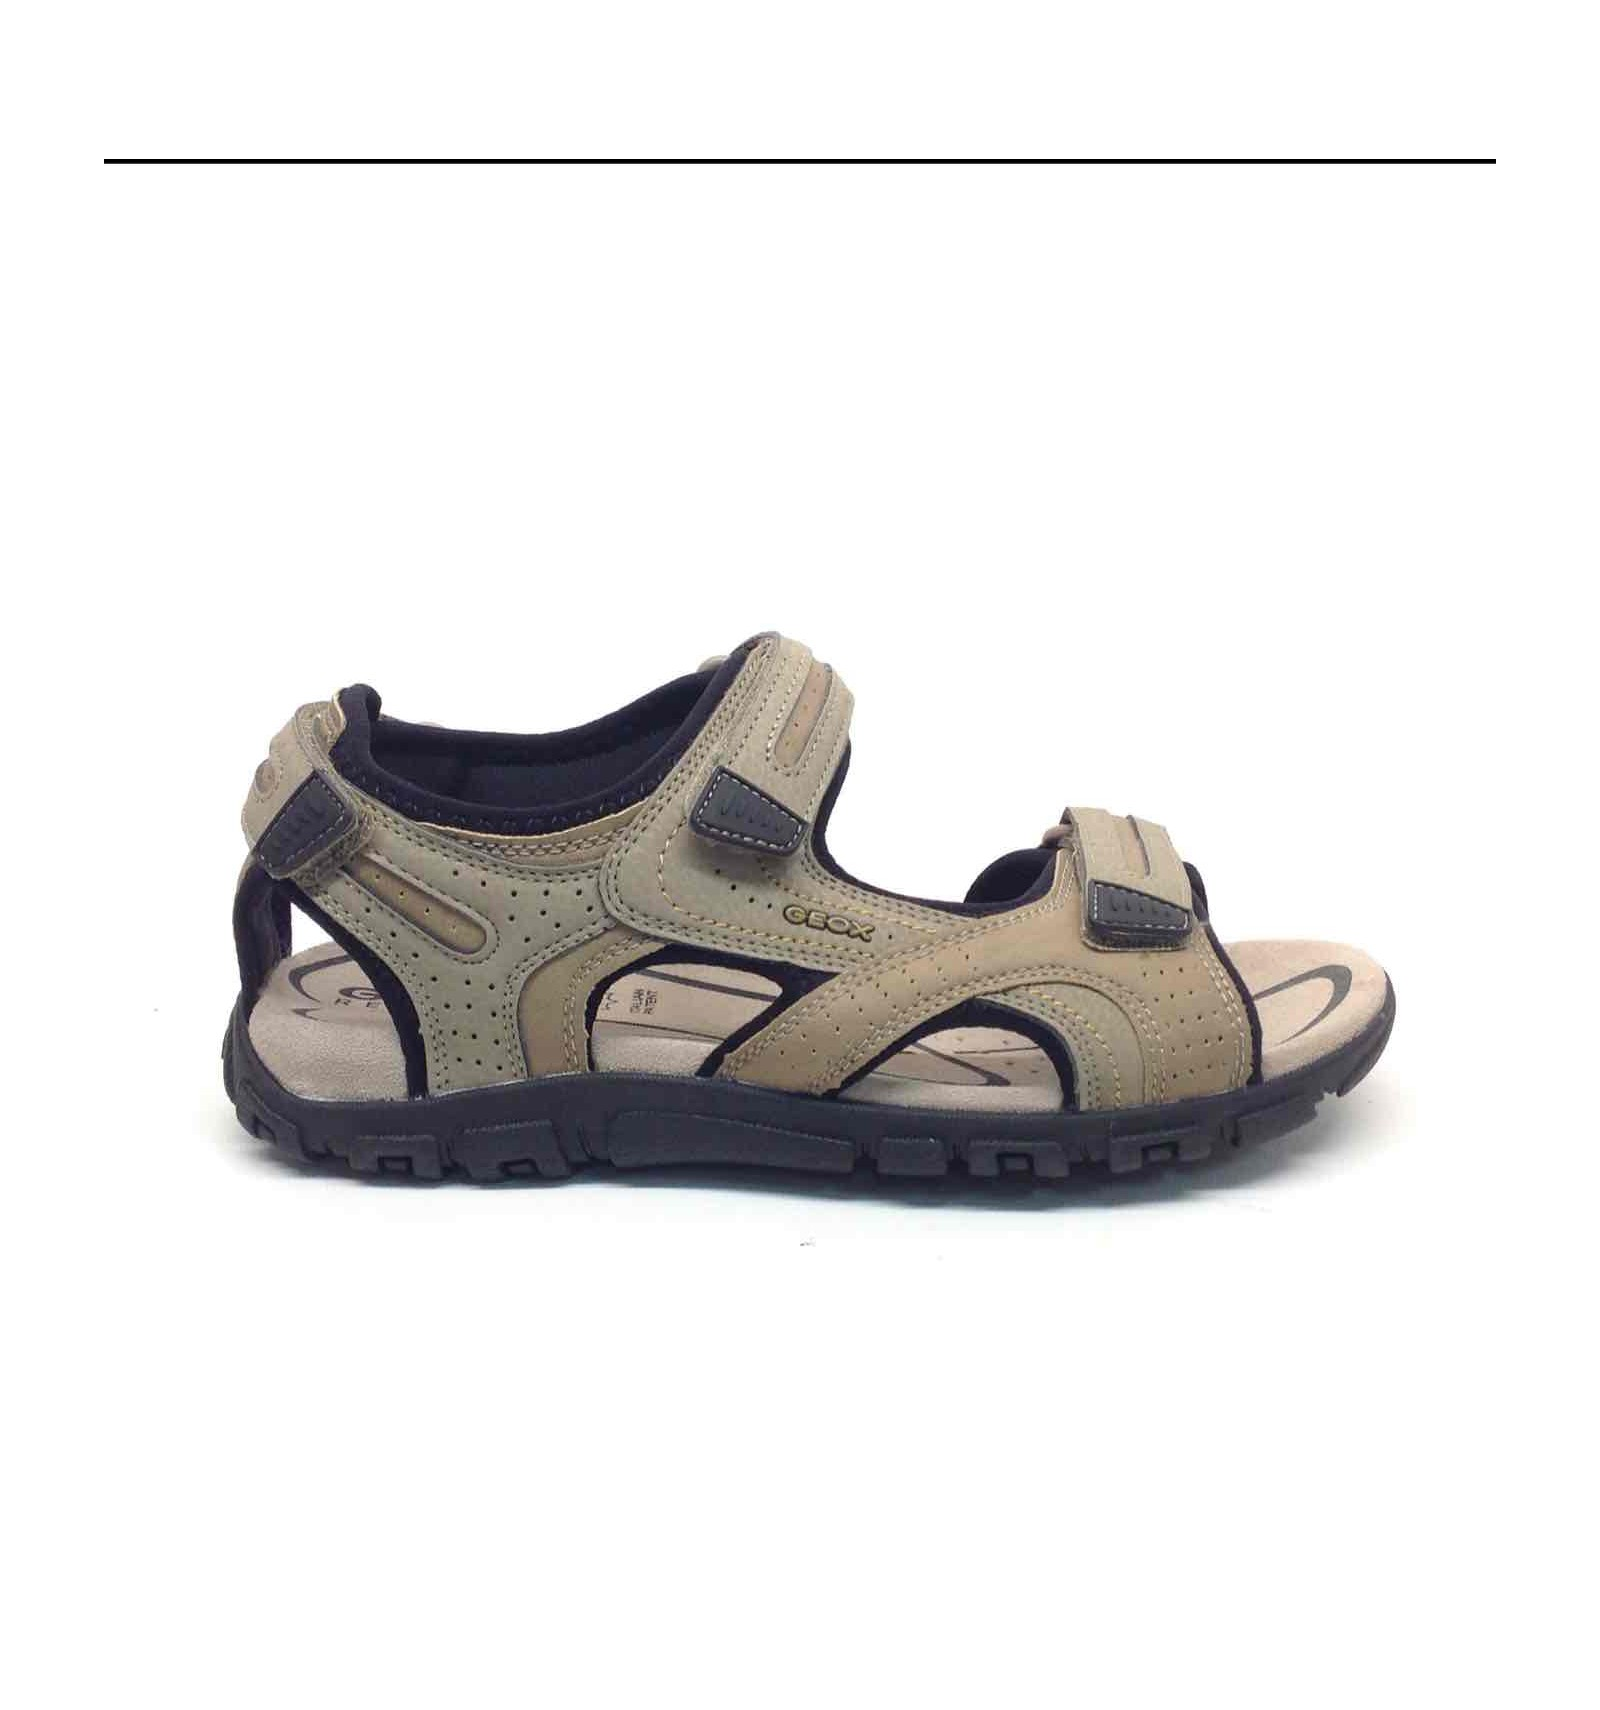 Geox Sport AU6224a Latini UomoSandaloUomo Sandal Strada hQrdCtxsB